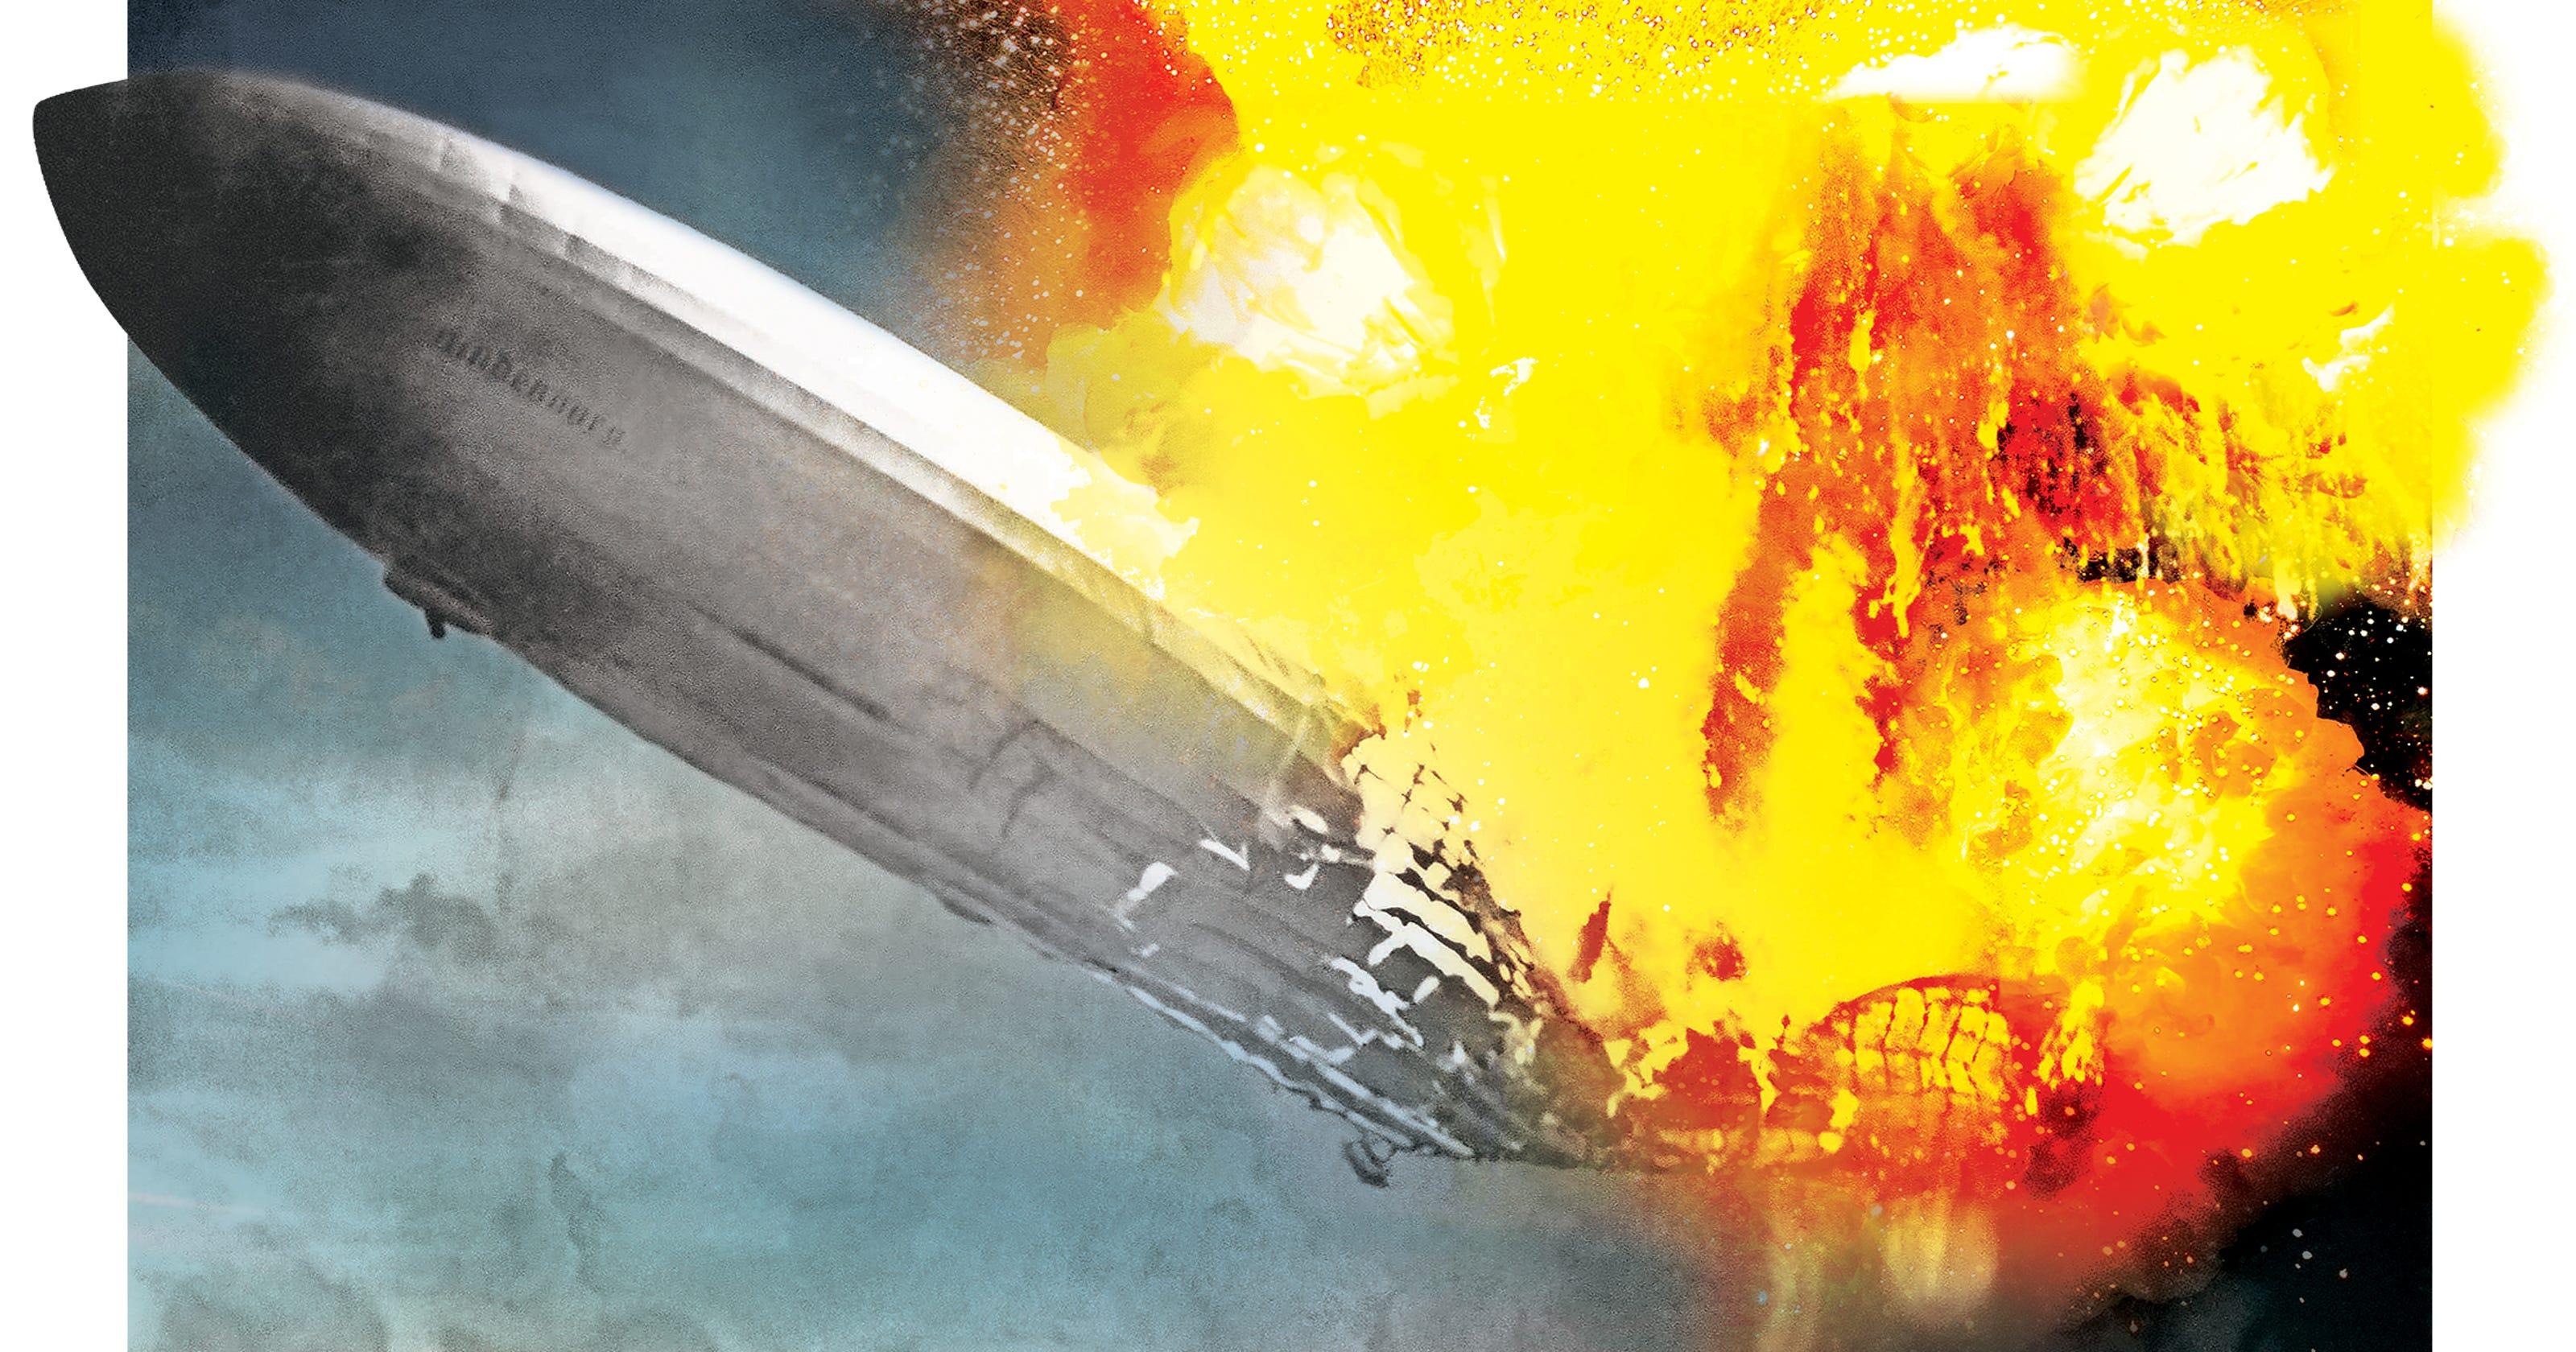 Hindenburg at 80: An interactive look into the tragic, fateful voyage